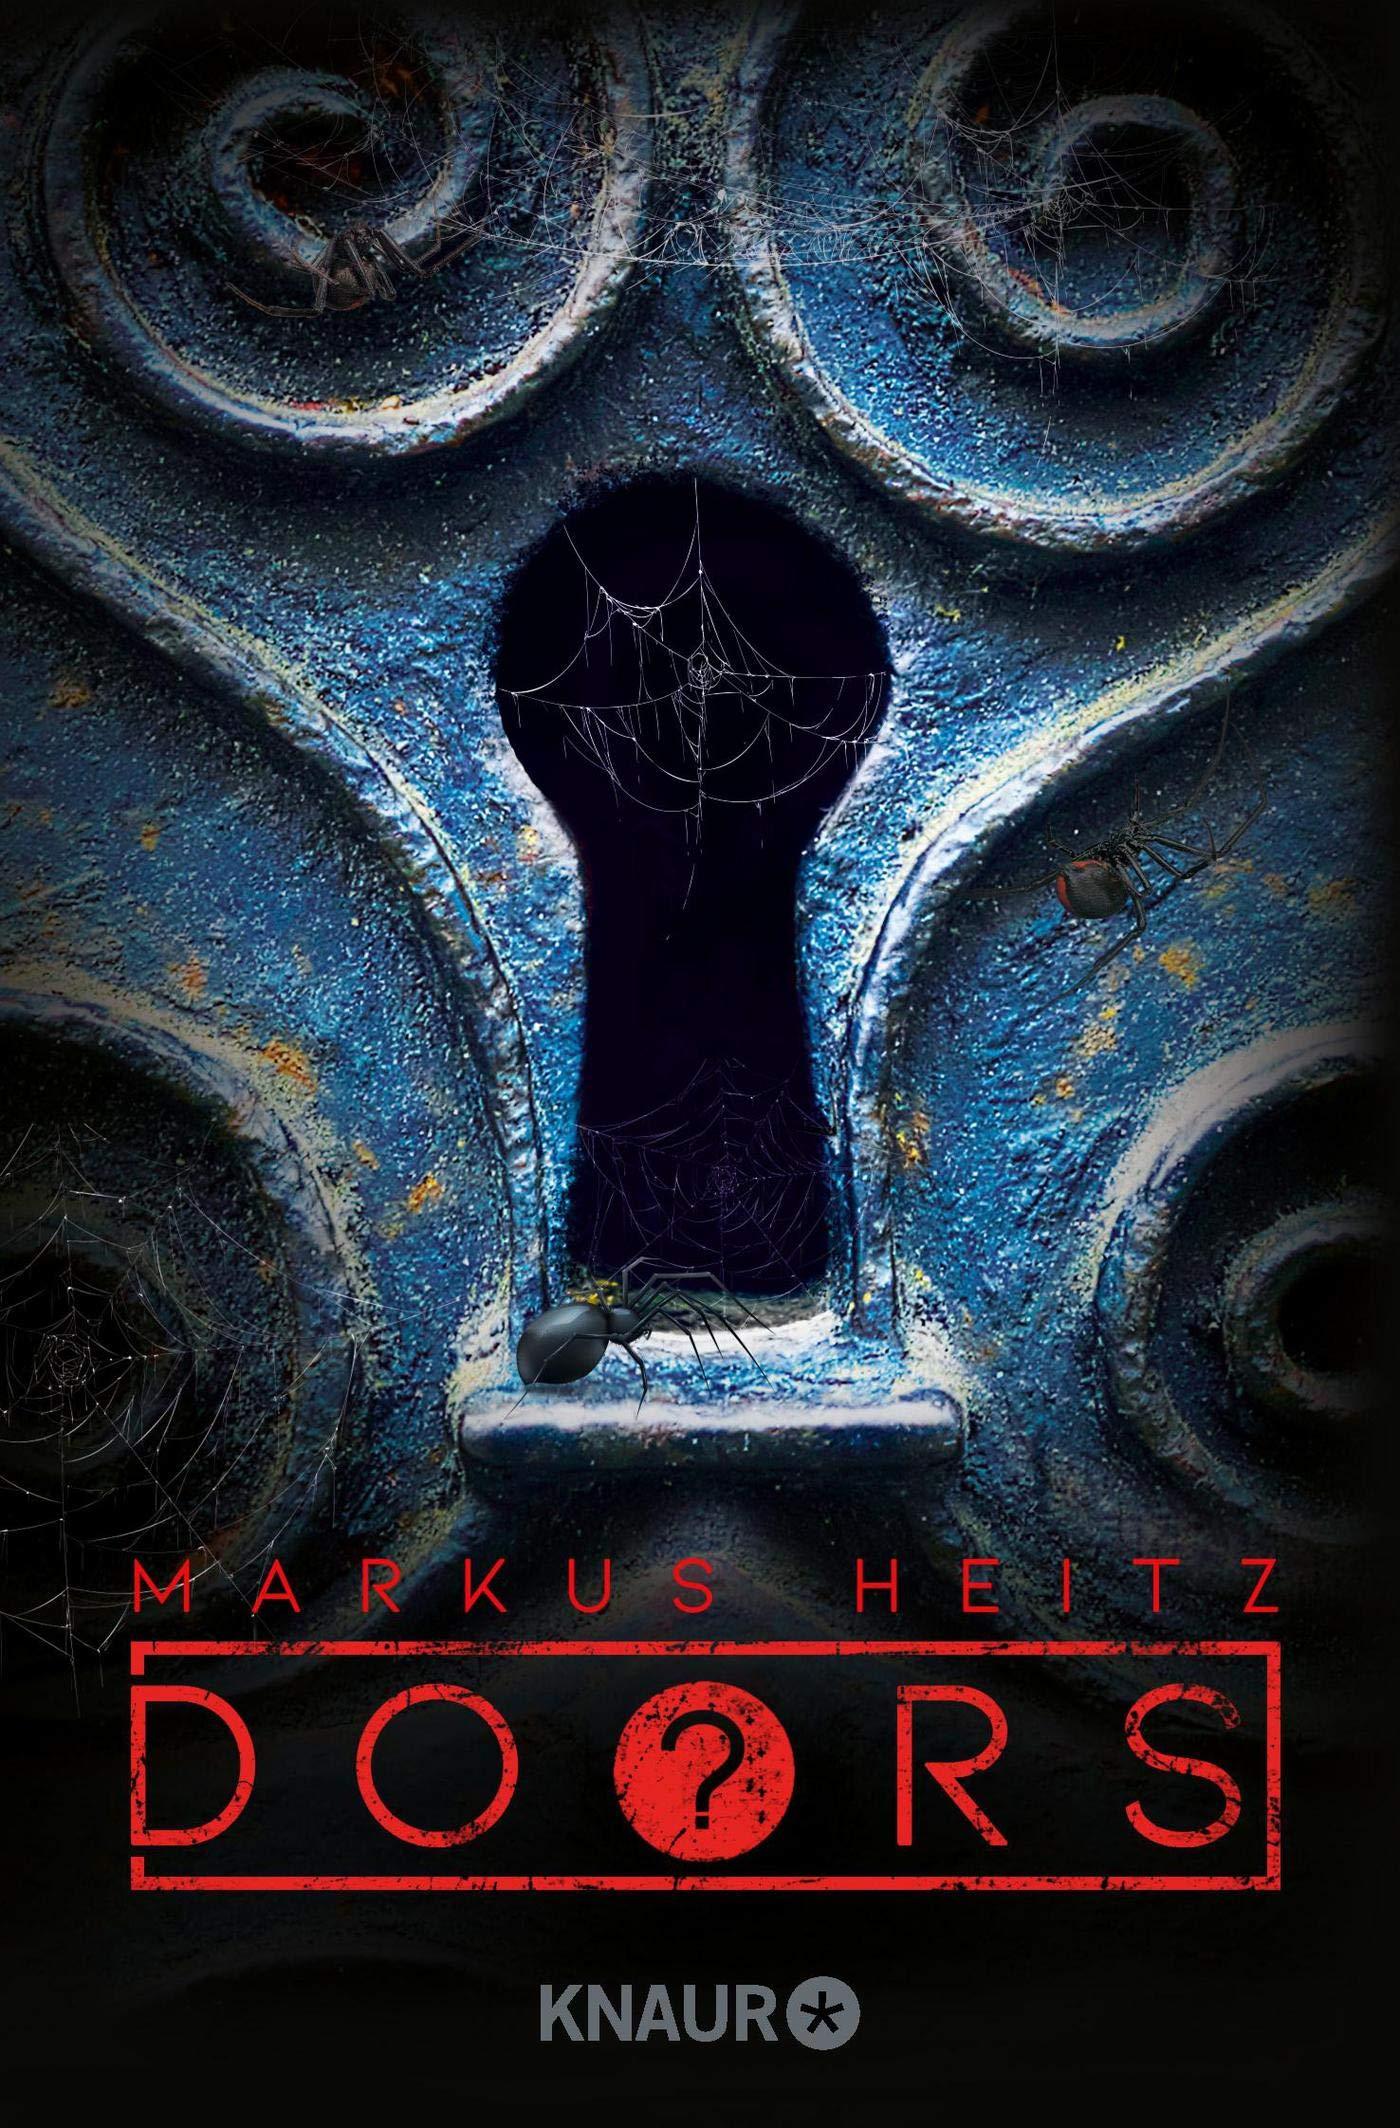 DOORS ? - Kolonie: Roman (Die Doors-Serie Staffel 1) Taschenbuch – 1. Oktober 2018 Markus Heitz Knaur TB 3426523884 Belletristik / Kriminalromane